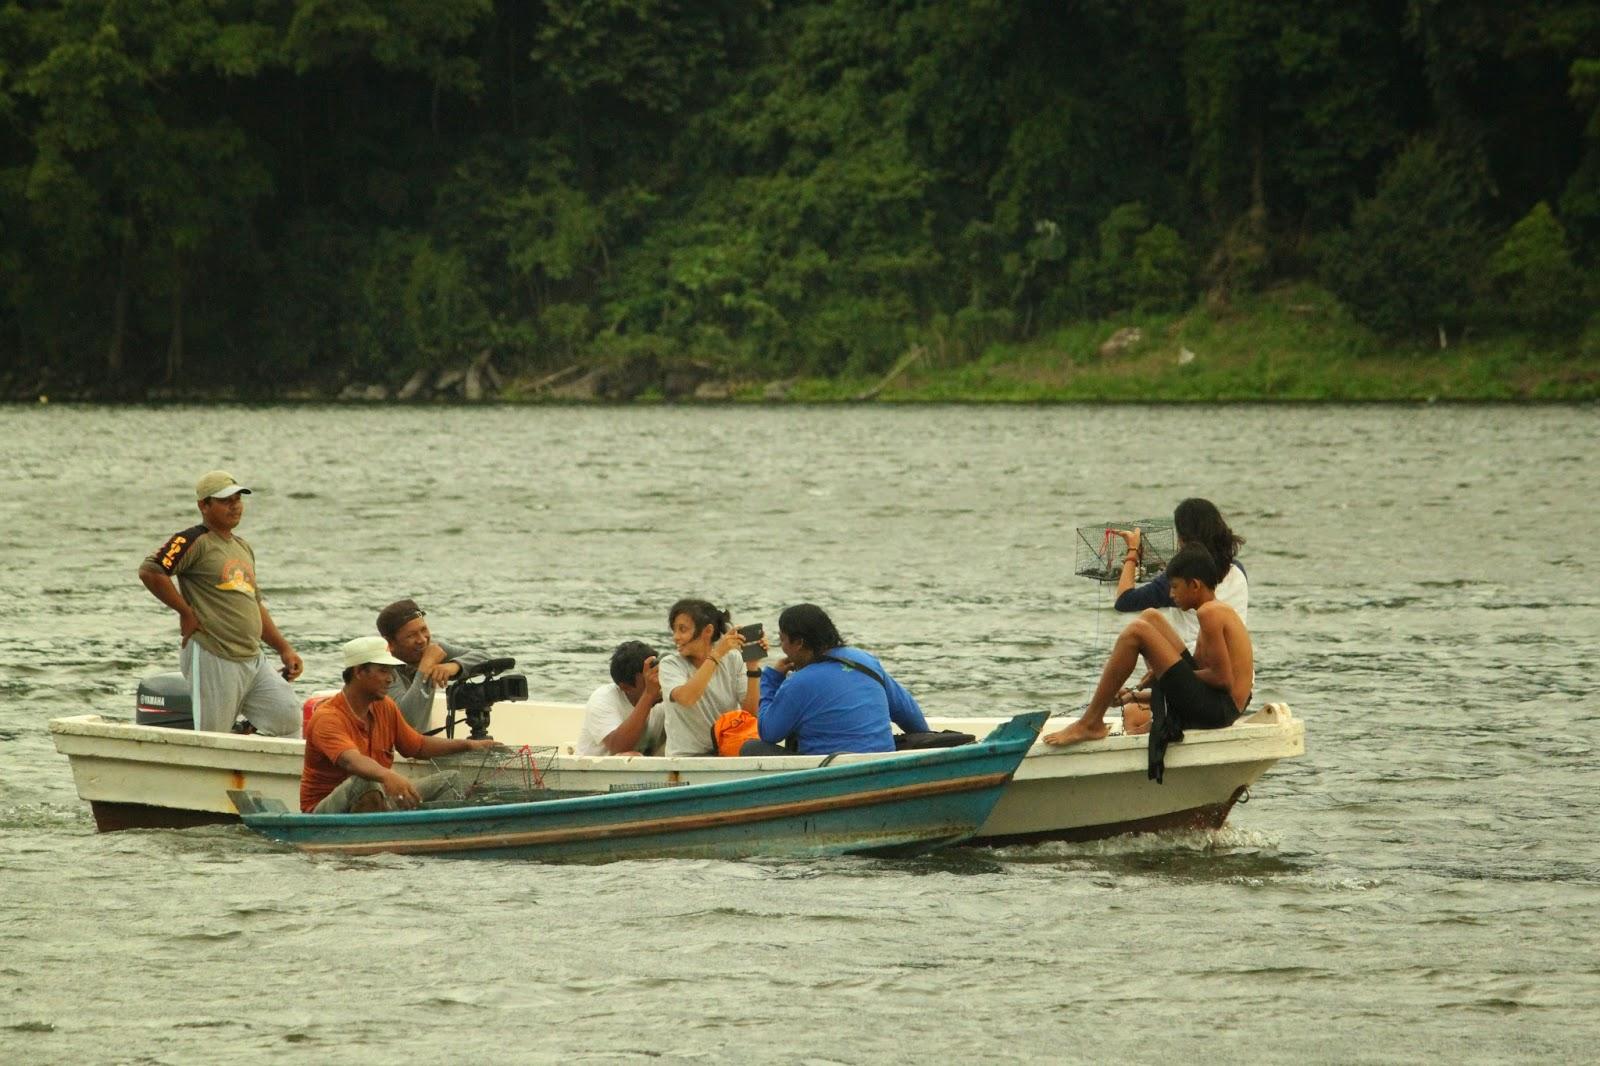 Gampong Wisata Aneuk Laot Jejak Petualang Trans 7 Liputan Lobster Di Danau Aneuk Laot Sabang